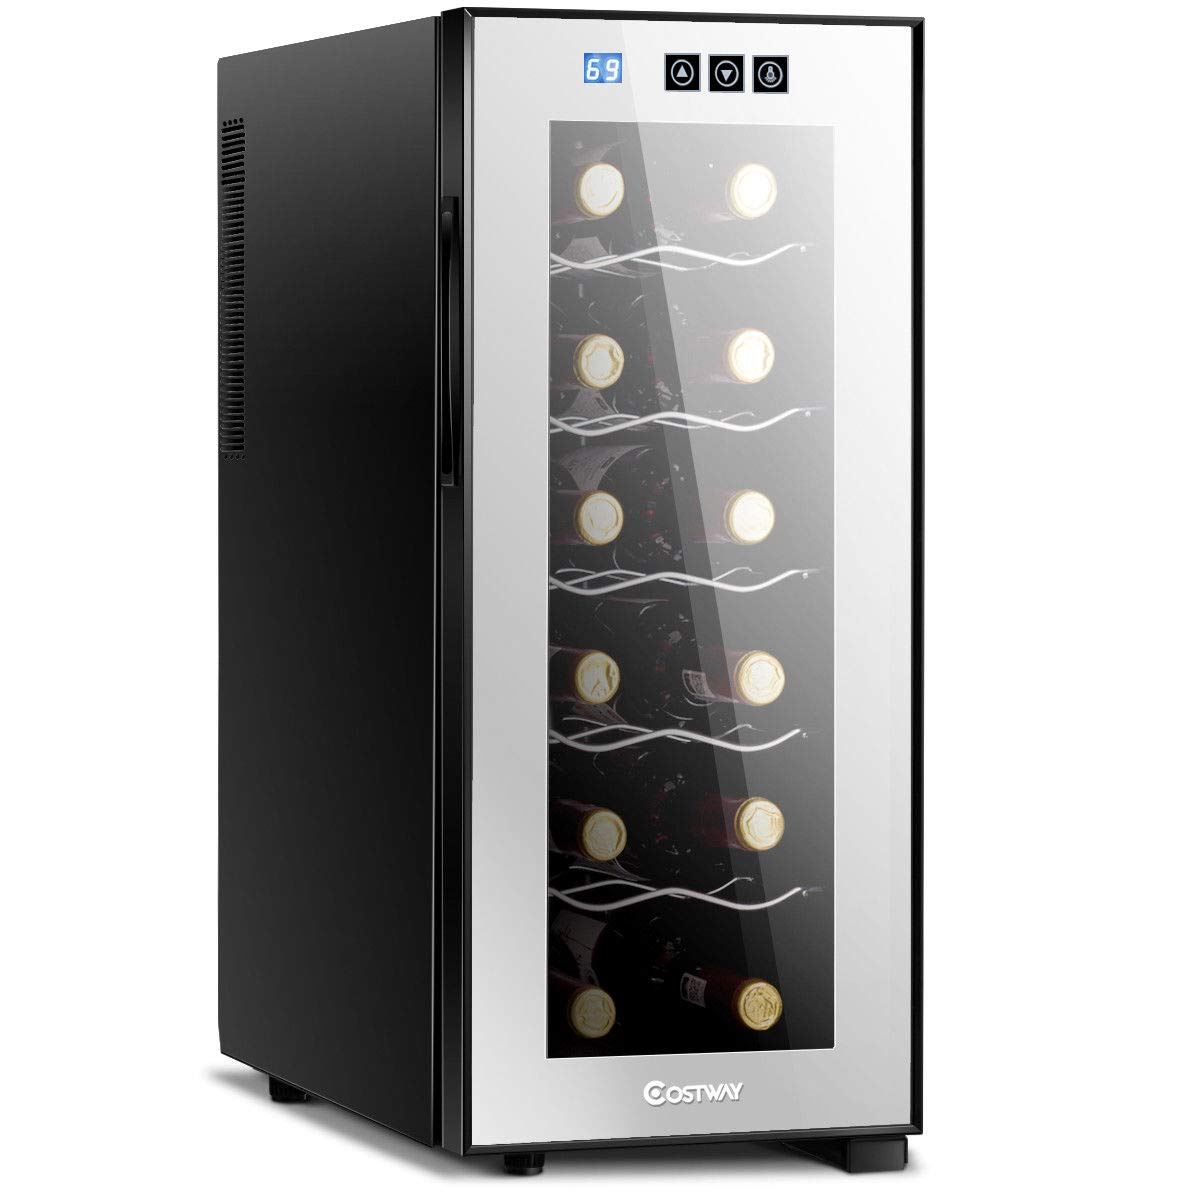 COSTWAY Thermoelectric Wine Cooler, 12 Bottles Freestanding Champagne Chiller, Counter Top Wine Cellar, with Digital Temperature Display, Smoked Glass Door, Quiet Operation Fridge, Black by COSTWAY